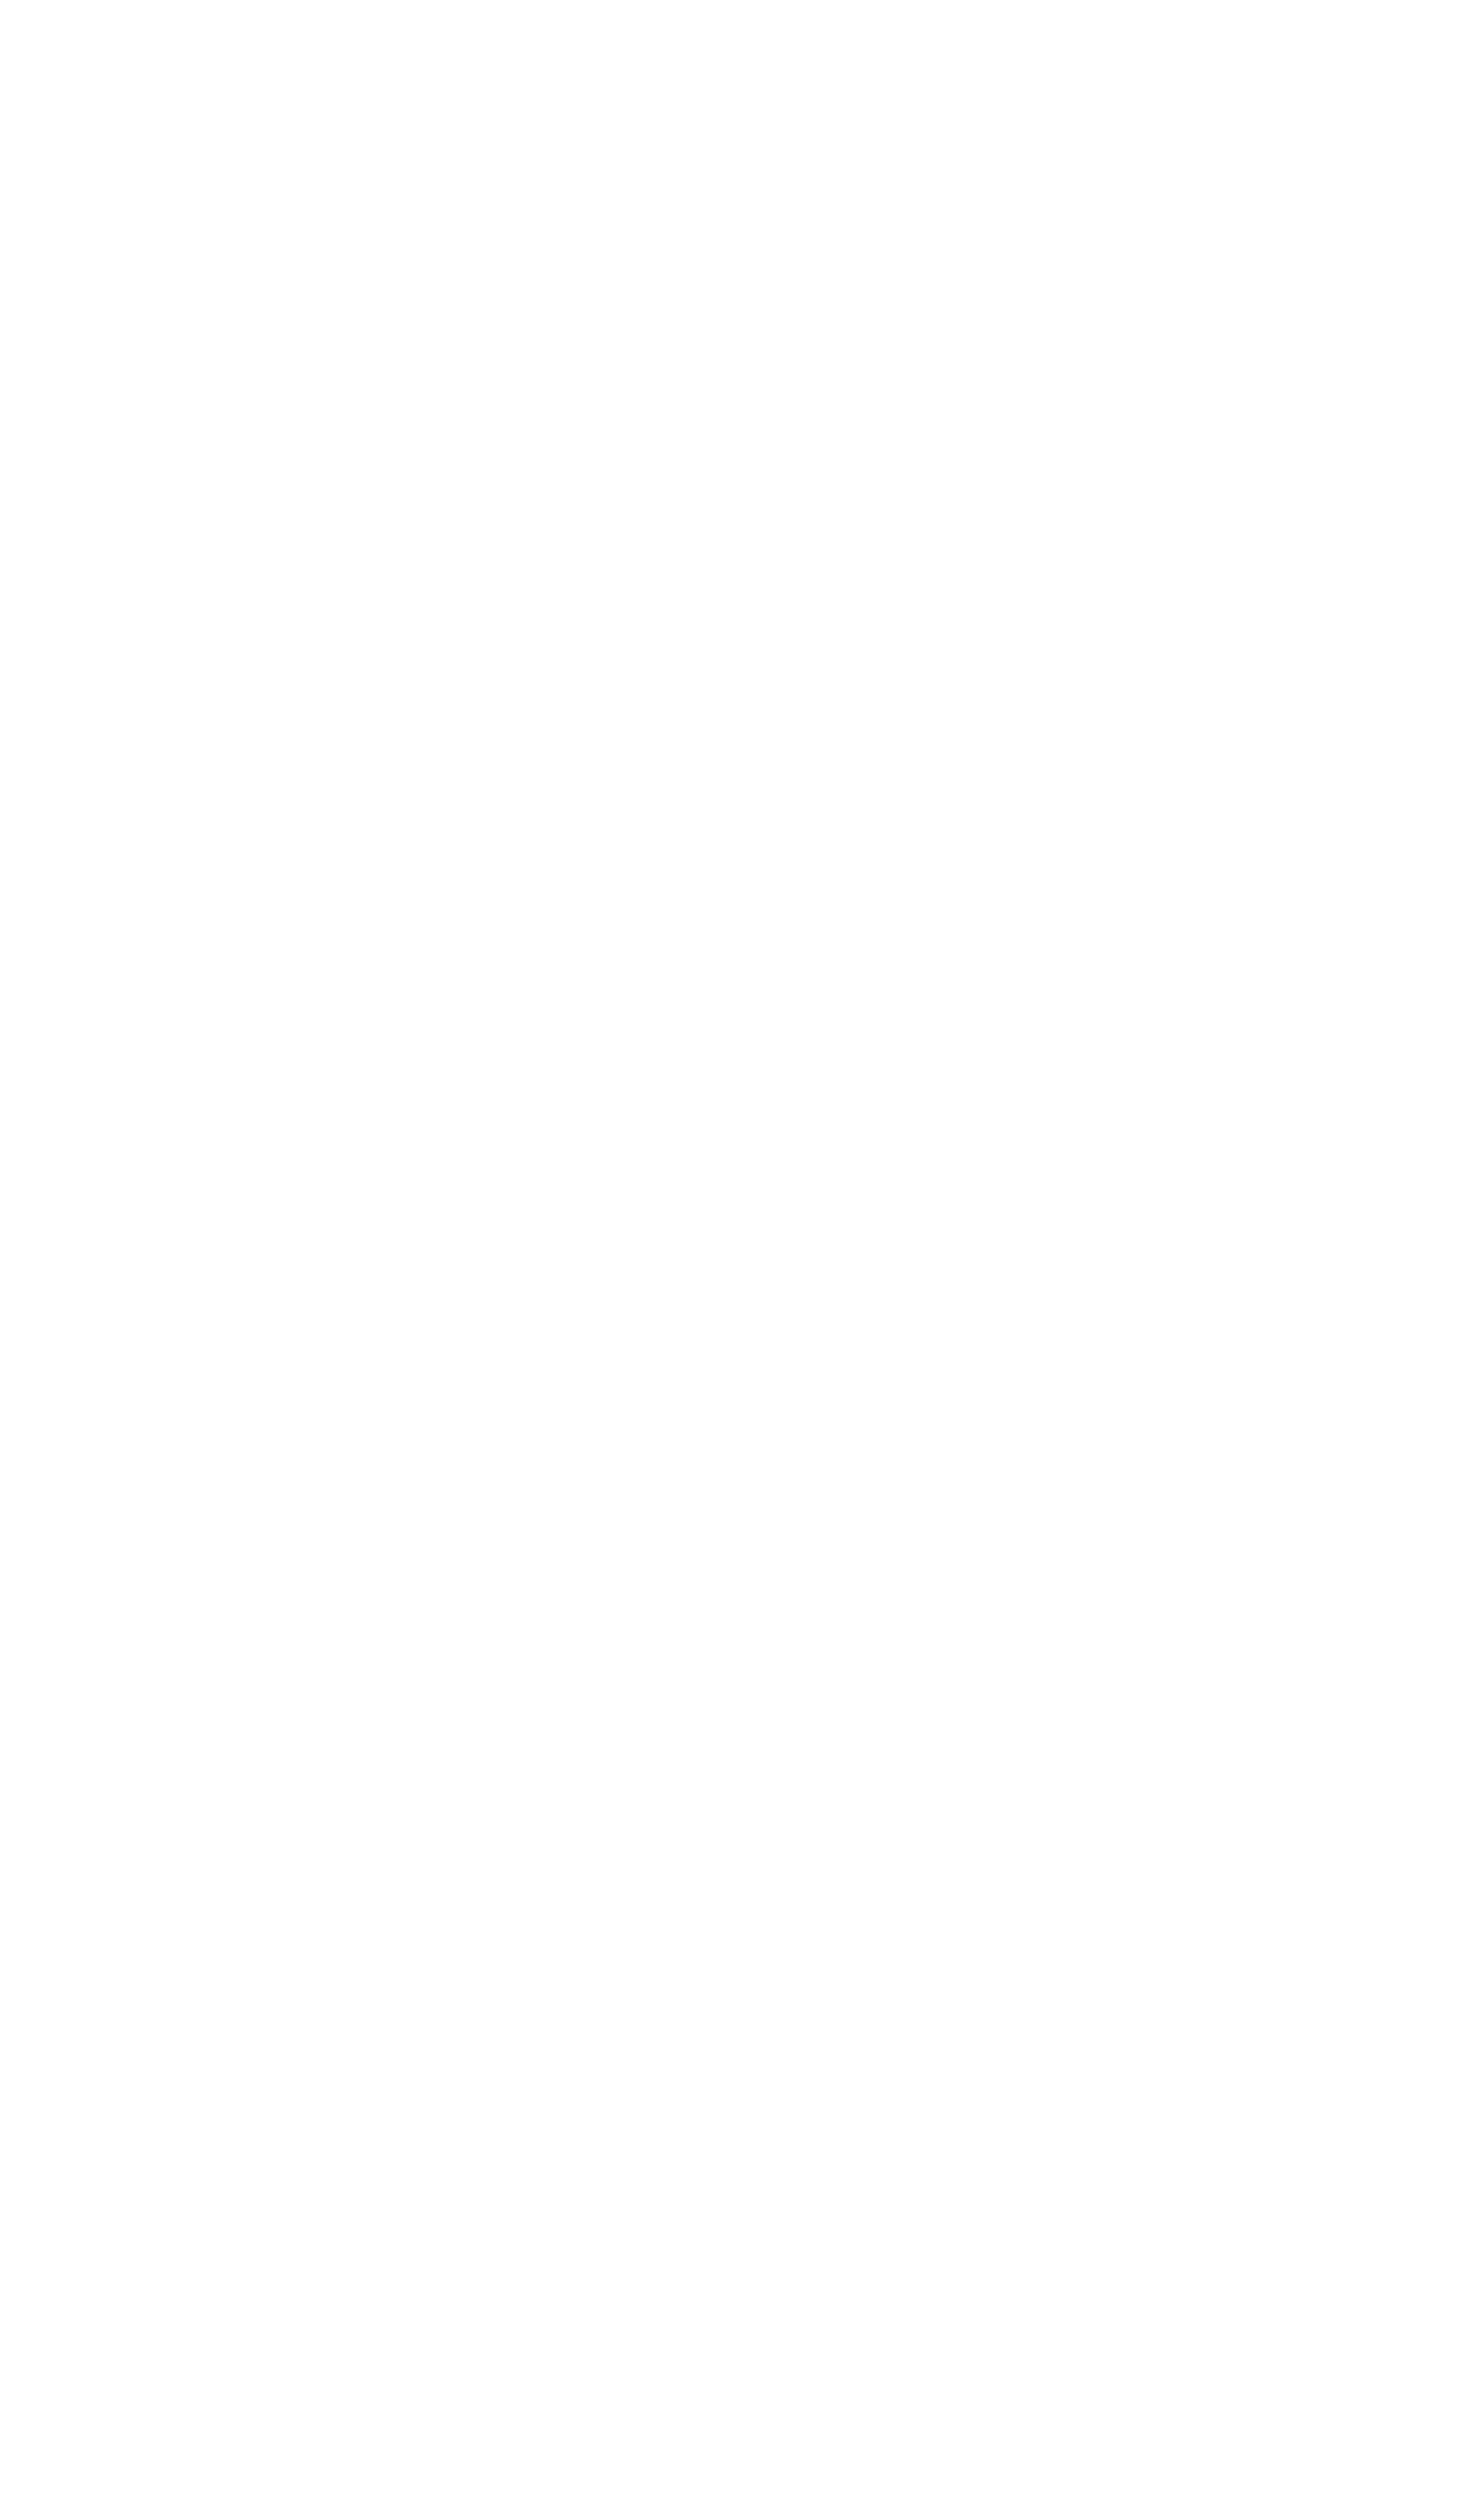 Iron Wolf Studio - logo